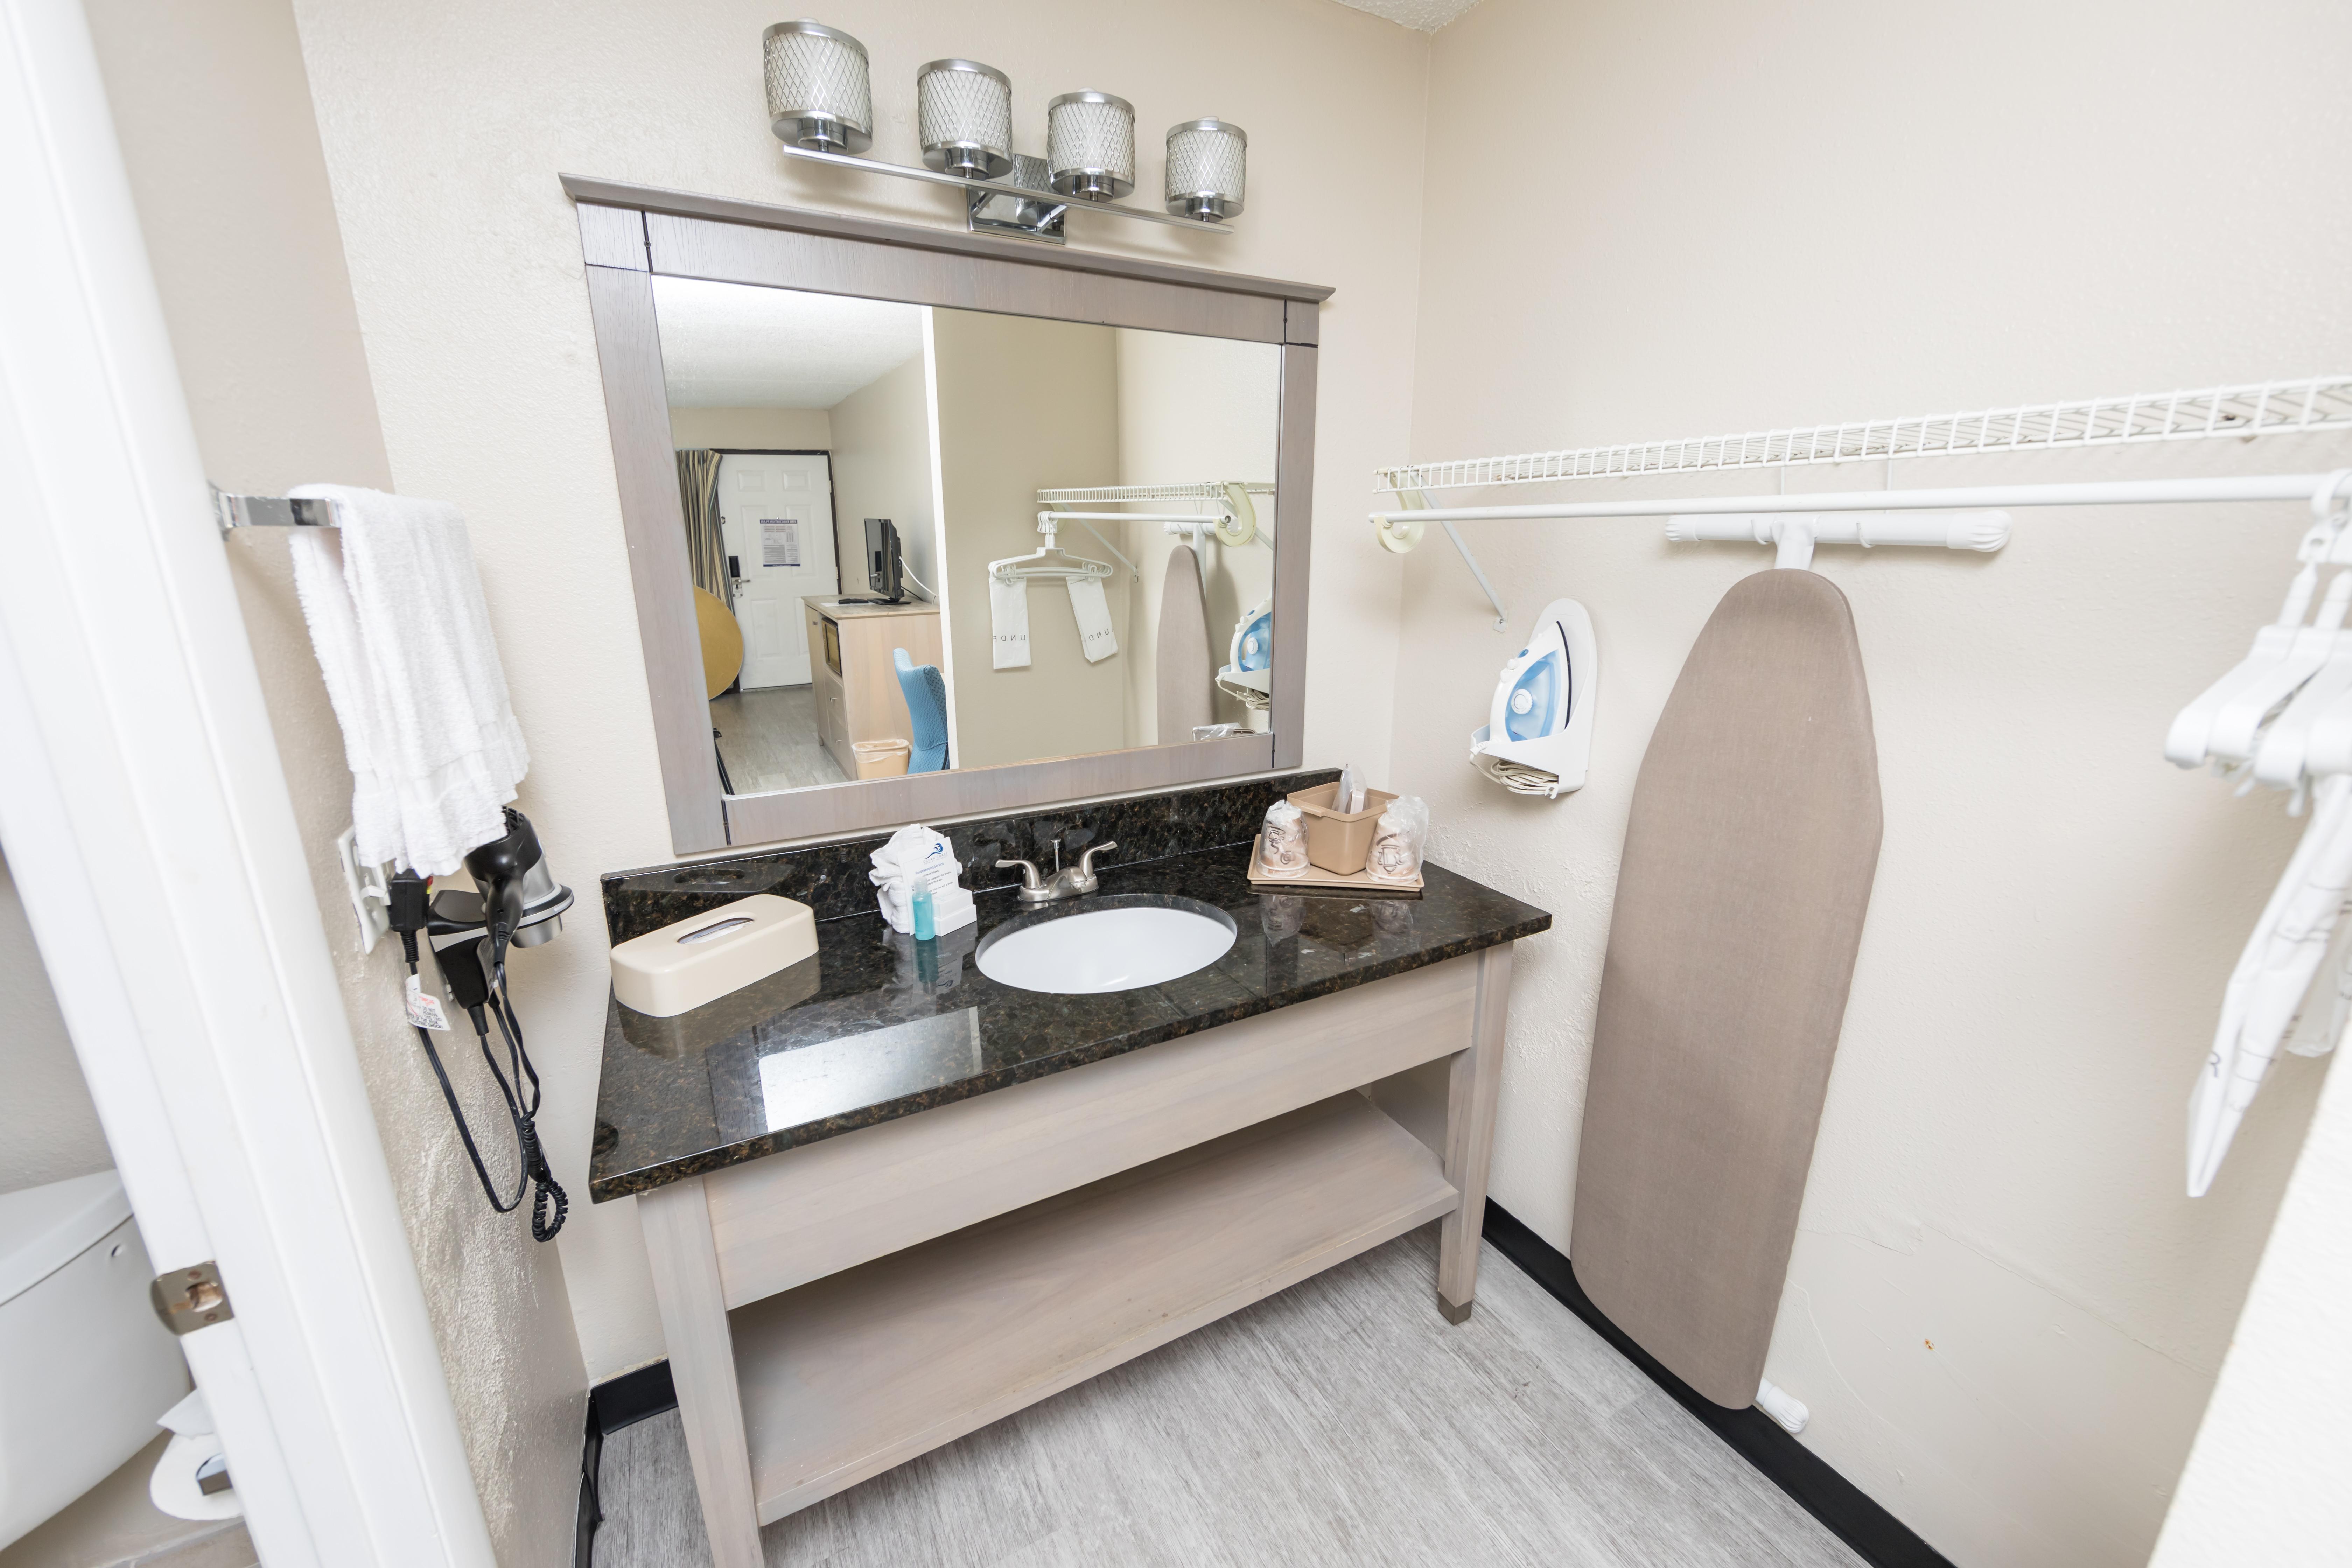 Ocean Coast Hotel Double Room Bathroom and Amenities